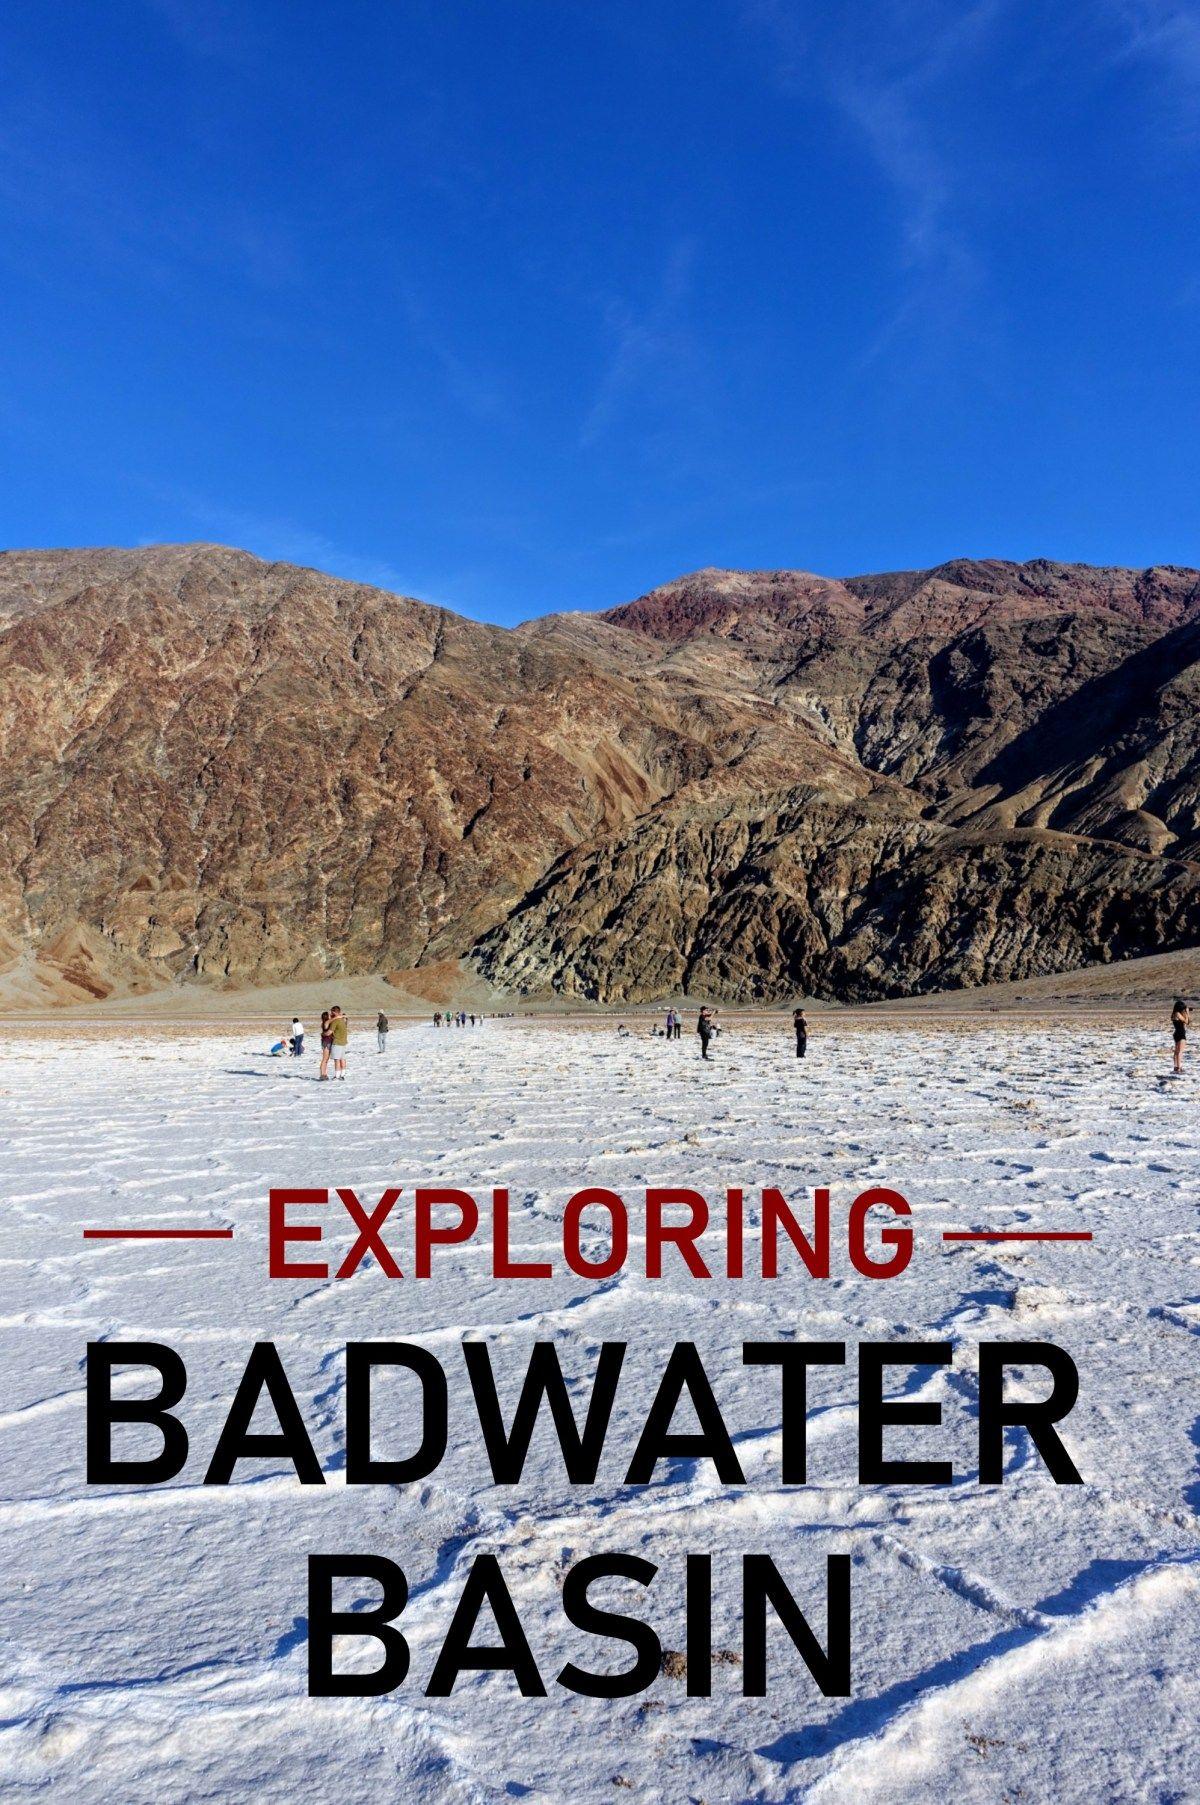 Exploring Badwater Basin Jack And Gab Explore Badwaterbasin Deathvalley Deathvalleyn Southern California Getaways Road Trip Fun Death Valley National Park